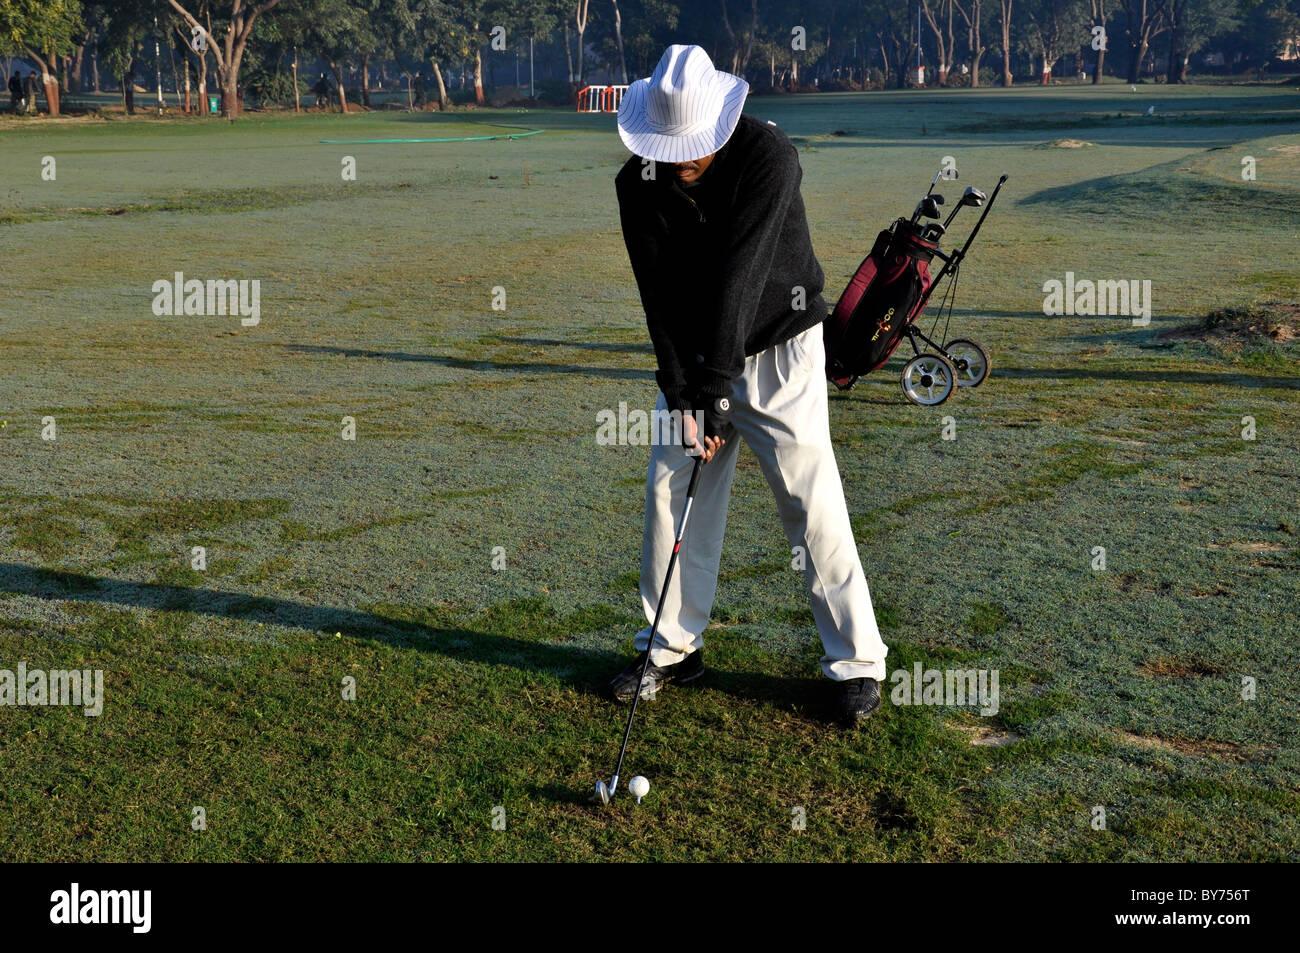 A golfer making tee shot - Stock Image